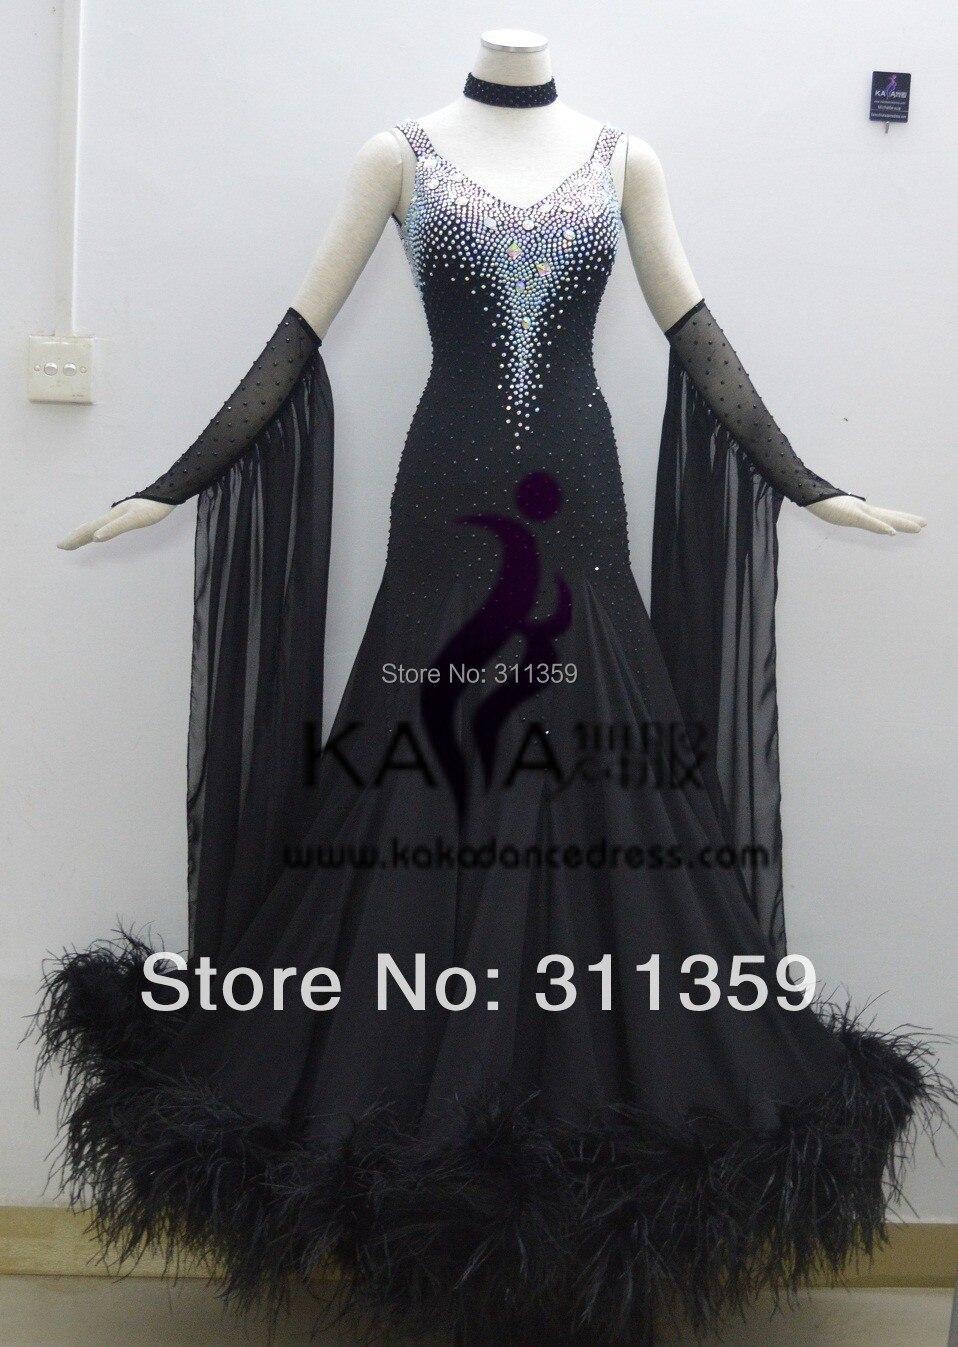 KAKA DANCE B1411 2014 New Style Black Feather Ballroom Standard Dance font b Dress b font